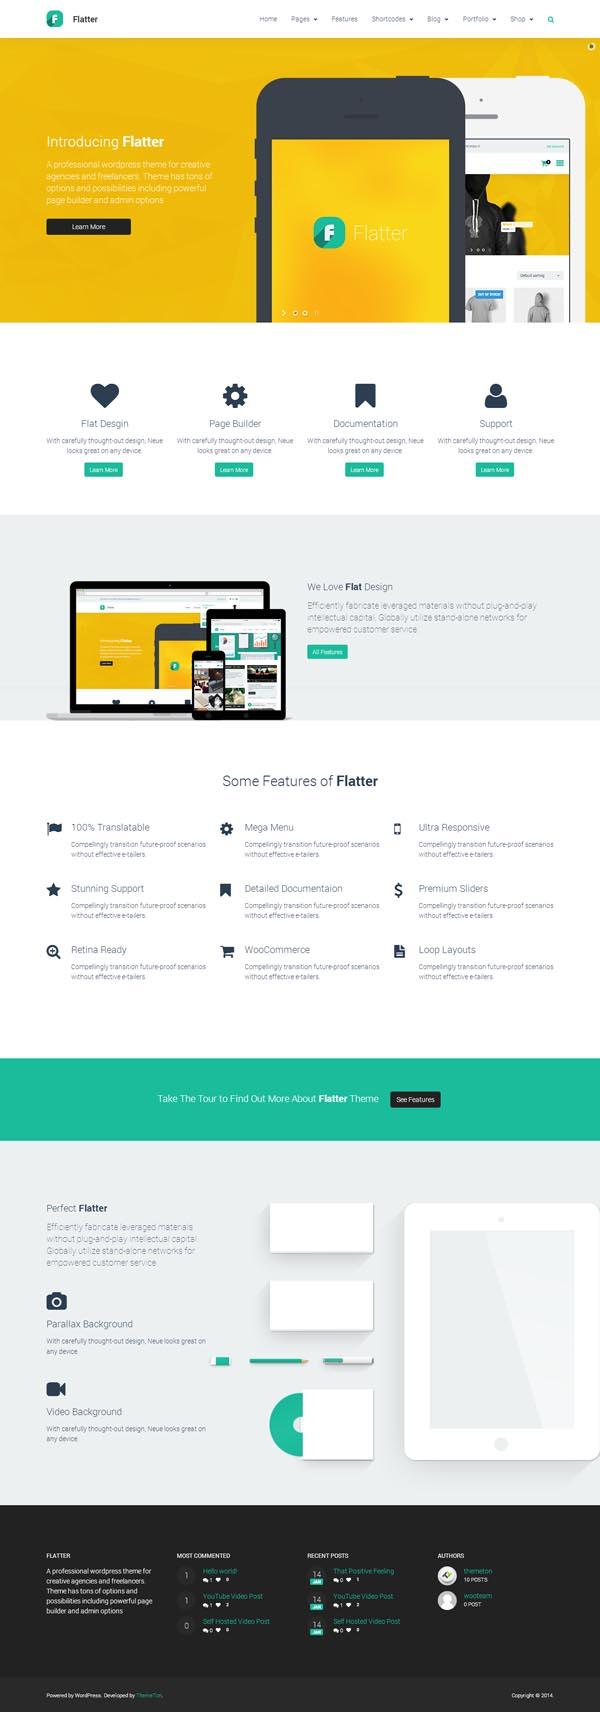 Flatter - Multi-Purpose Theme for Your Creativity